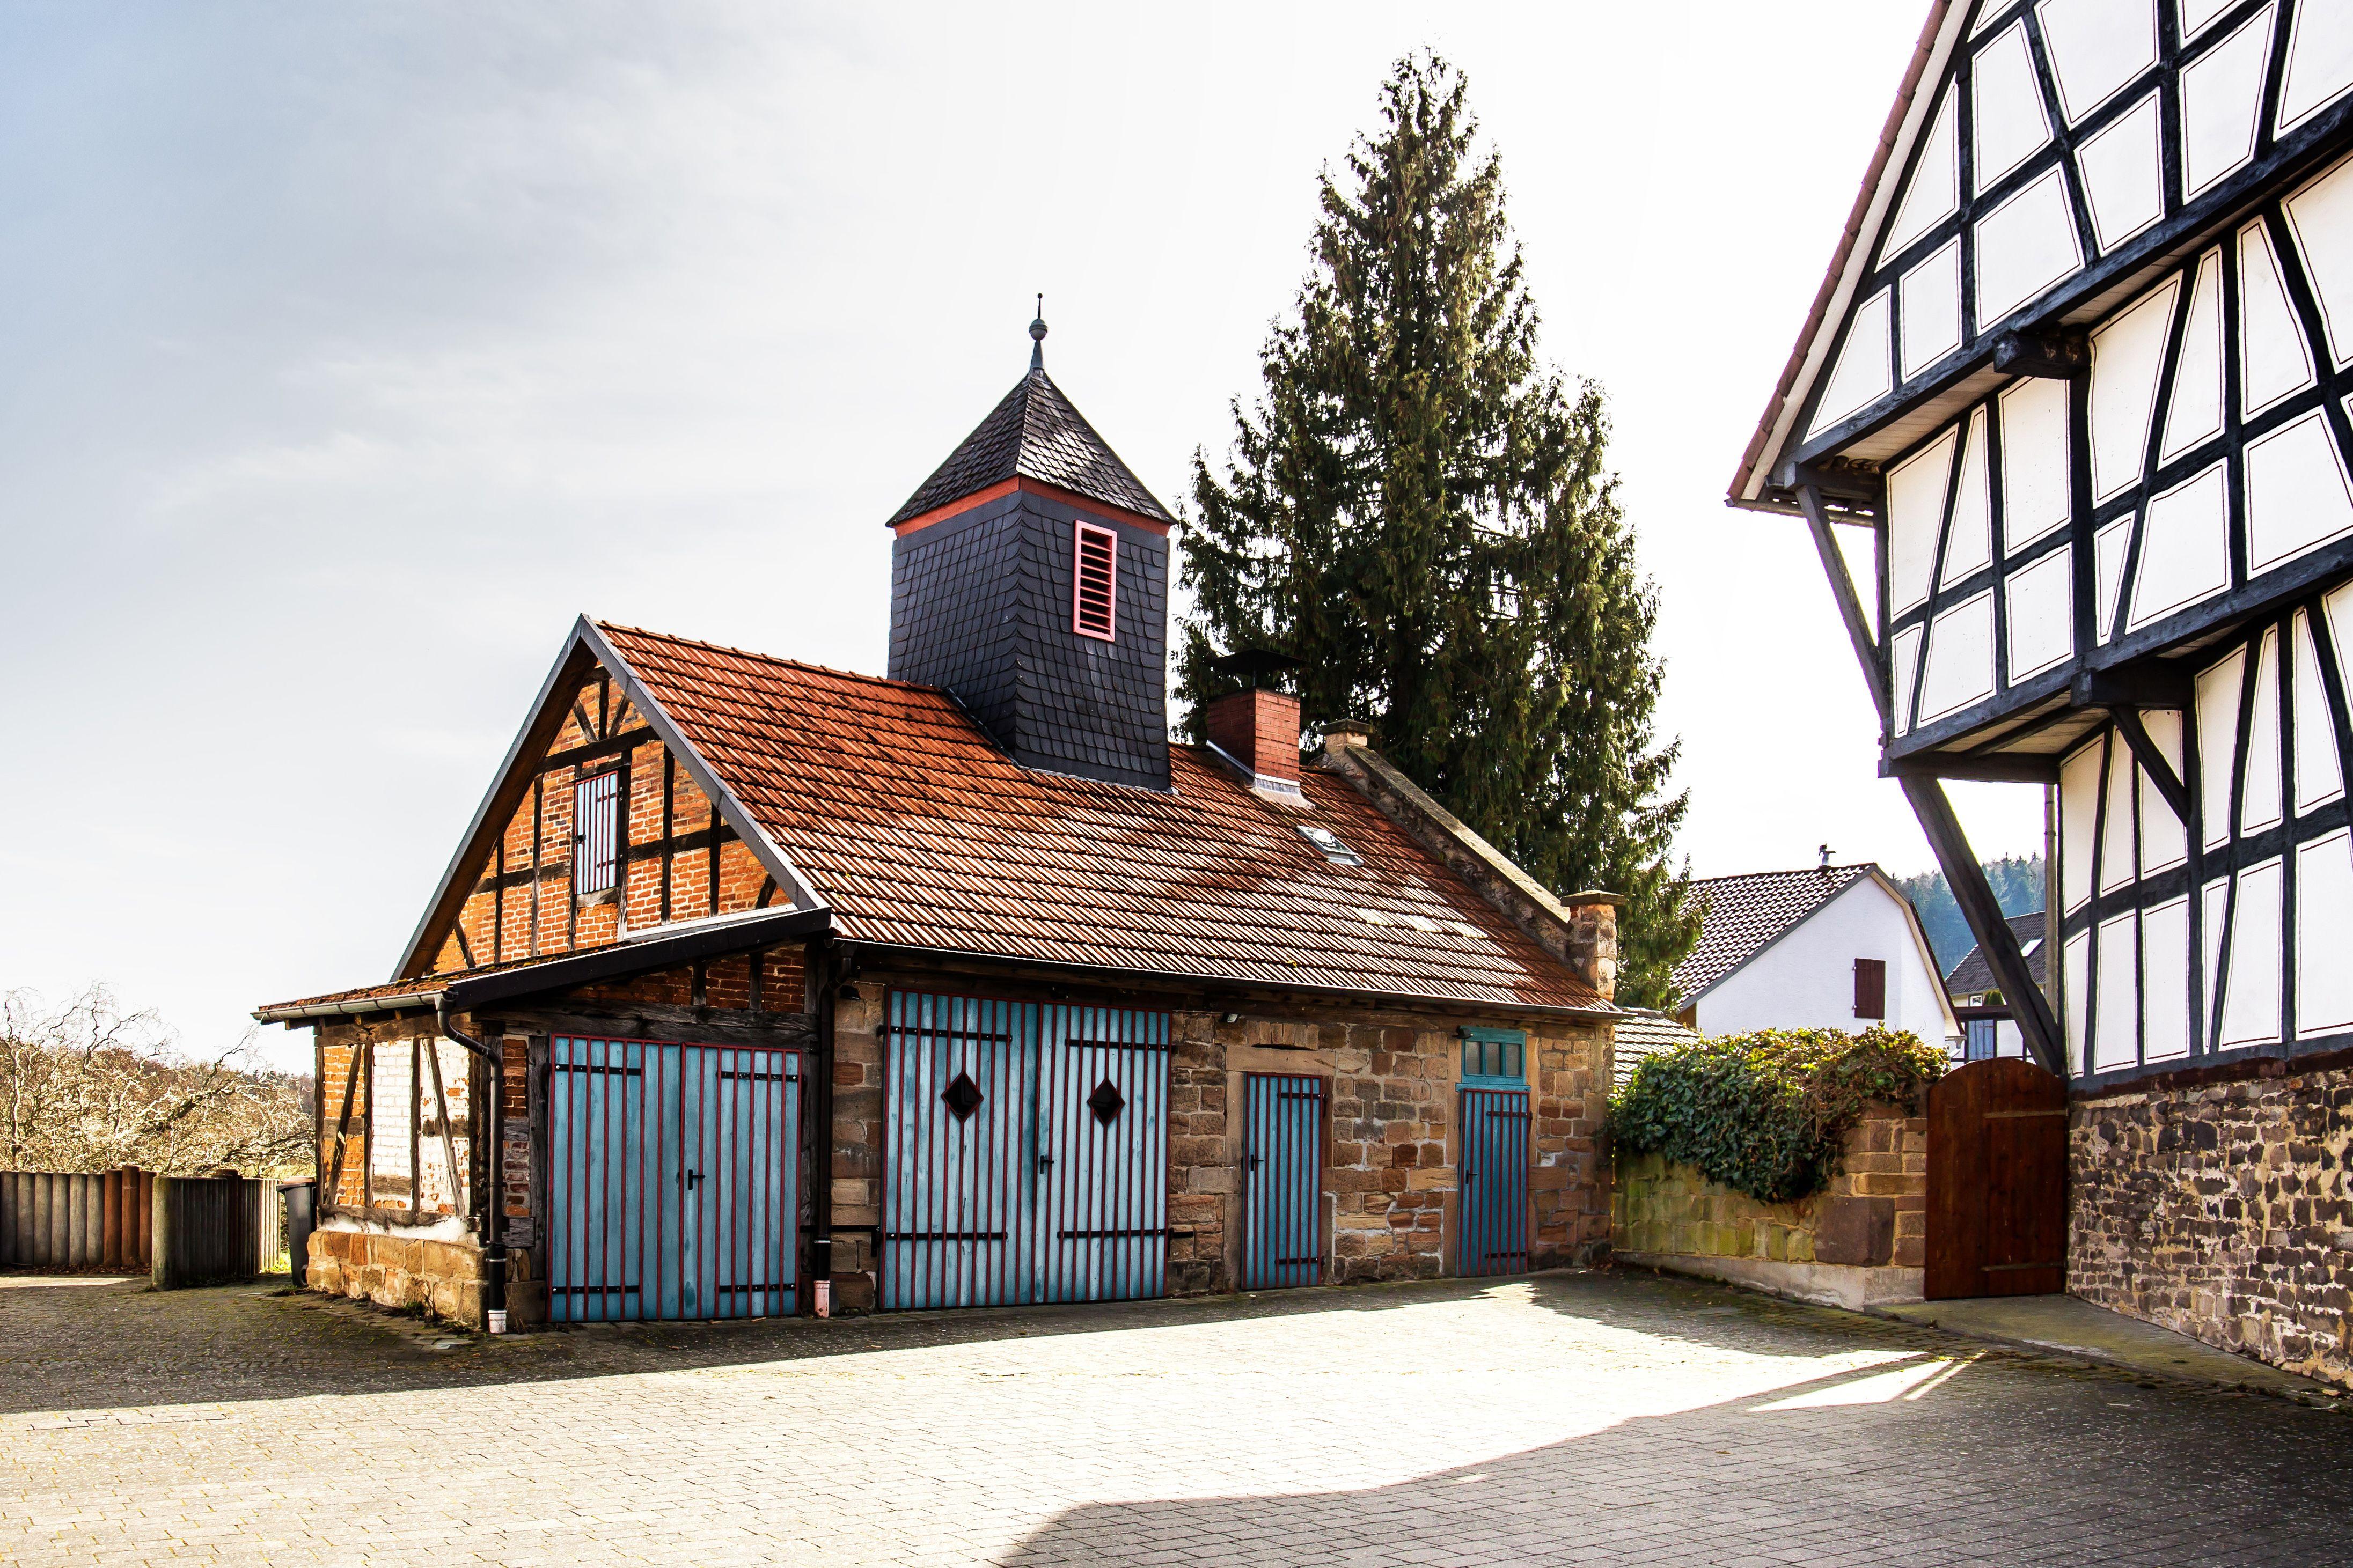 Antrifttal Seibelsdorf Backhaus Haus